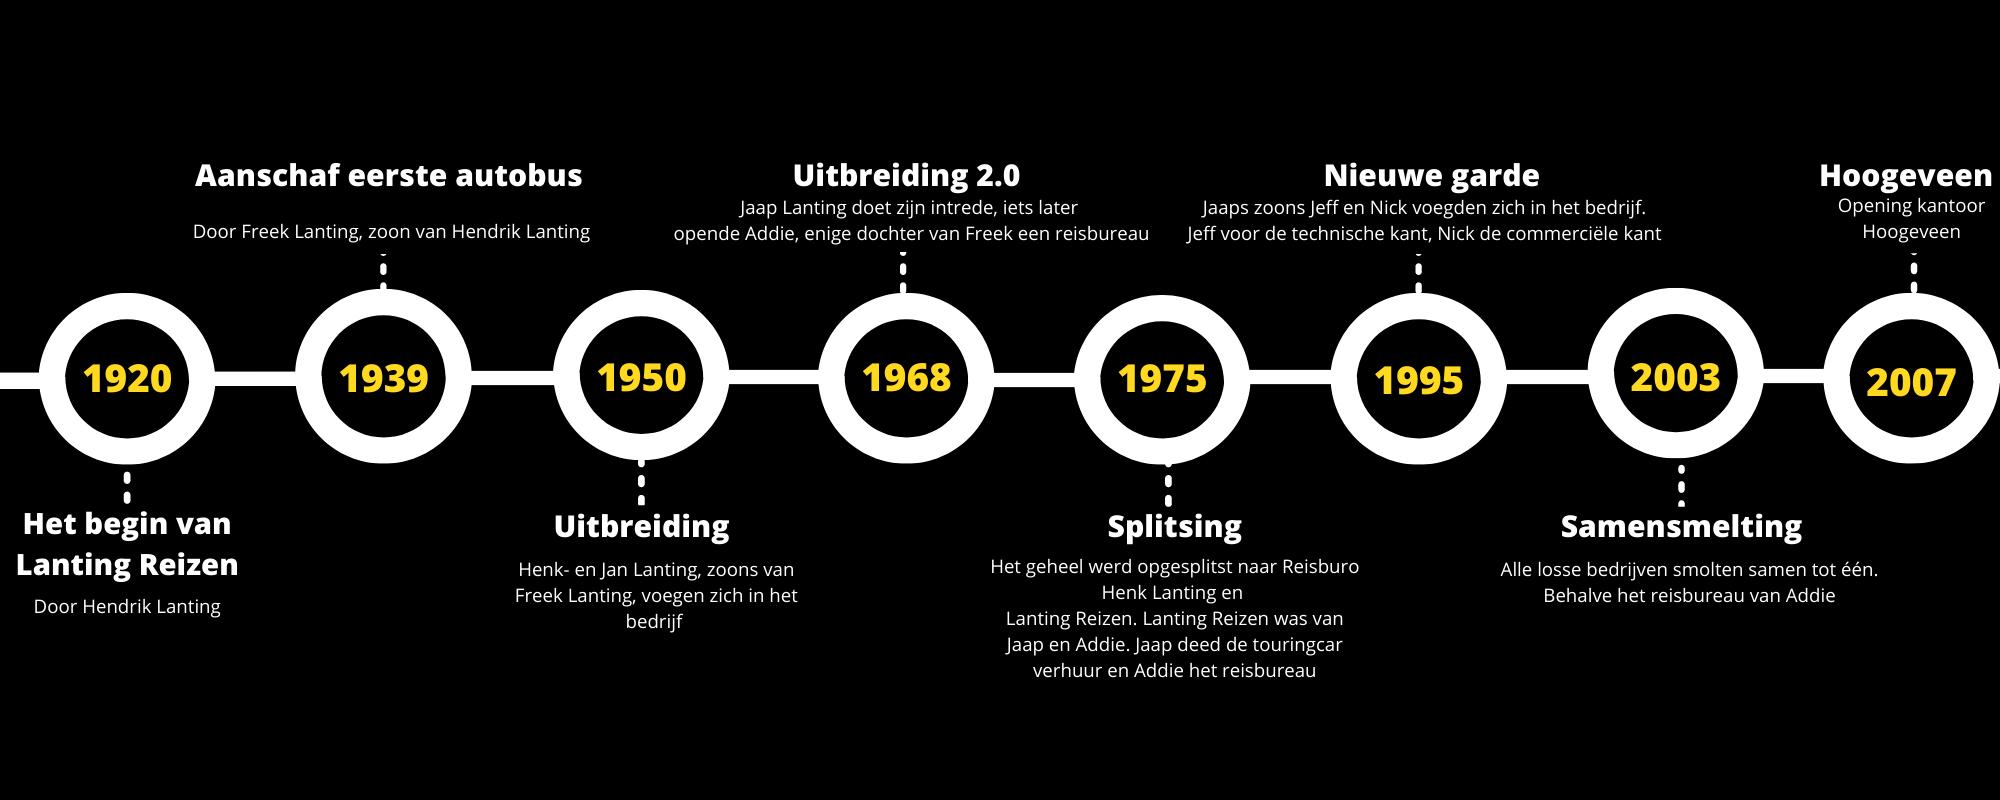 Geschiedenis Lanting Reizen